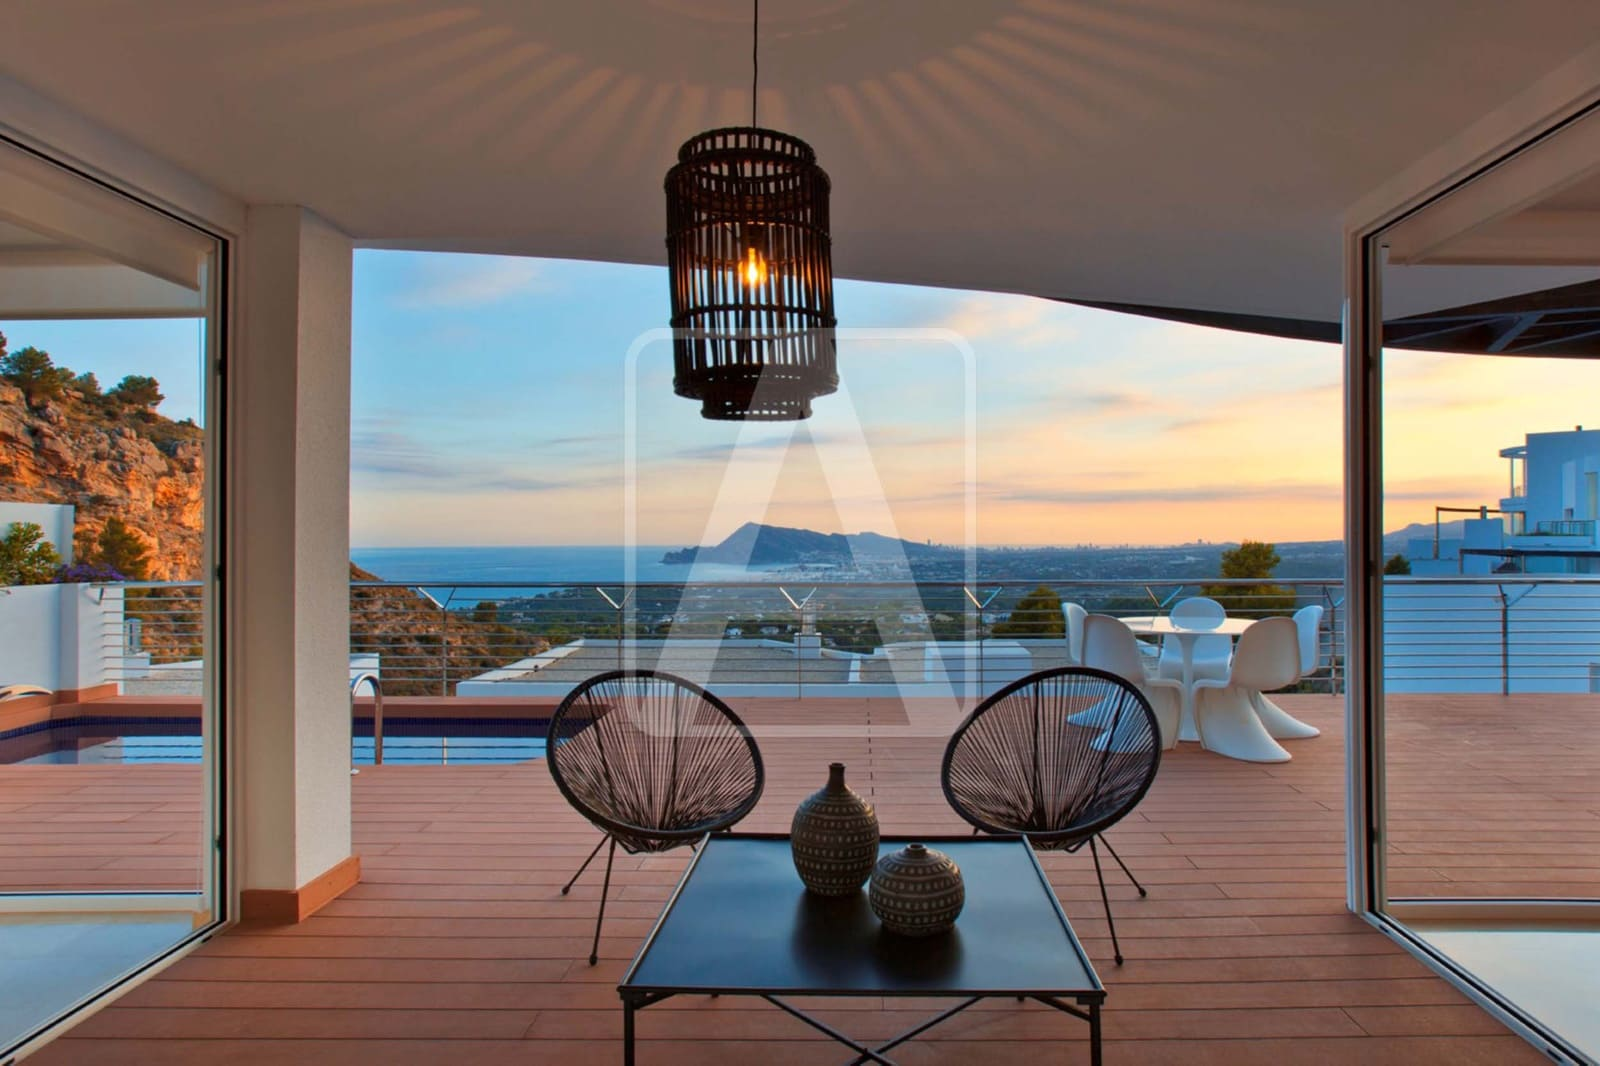 3 bedroom Villa for sale in Altea with pool garage - € 646,000 (Ref: 5863171)